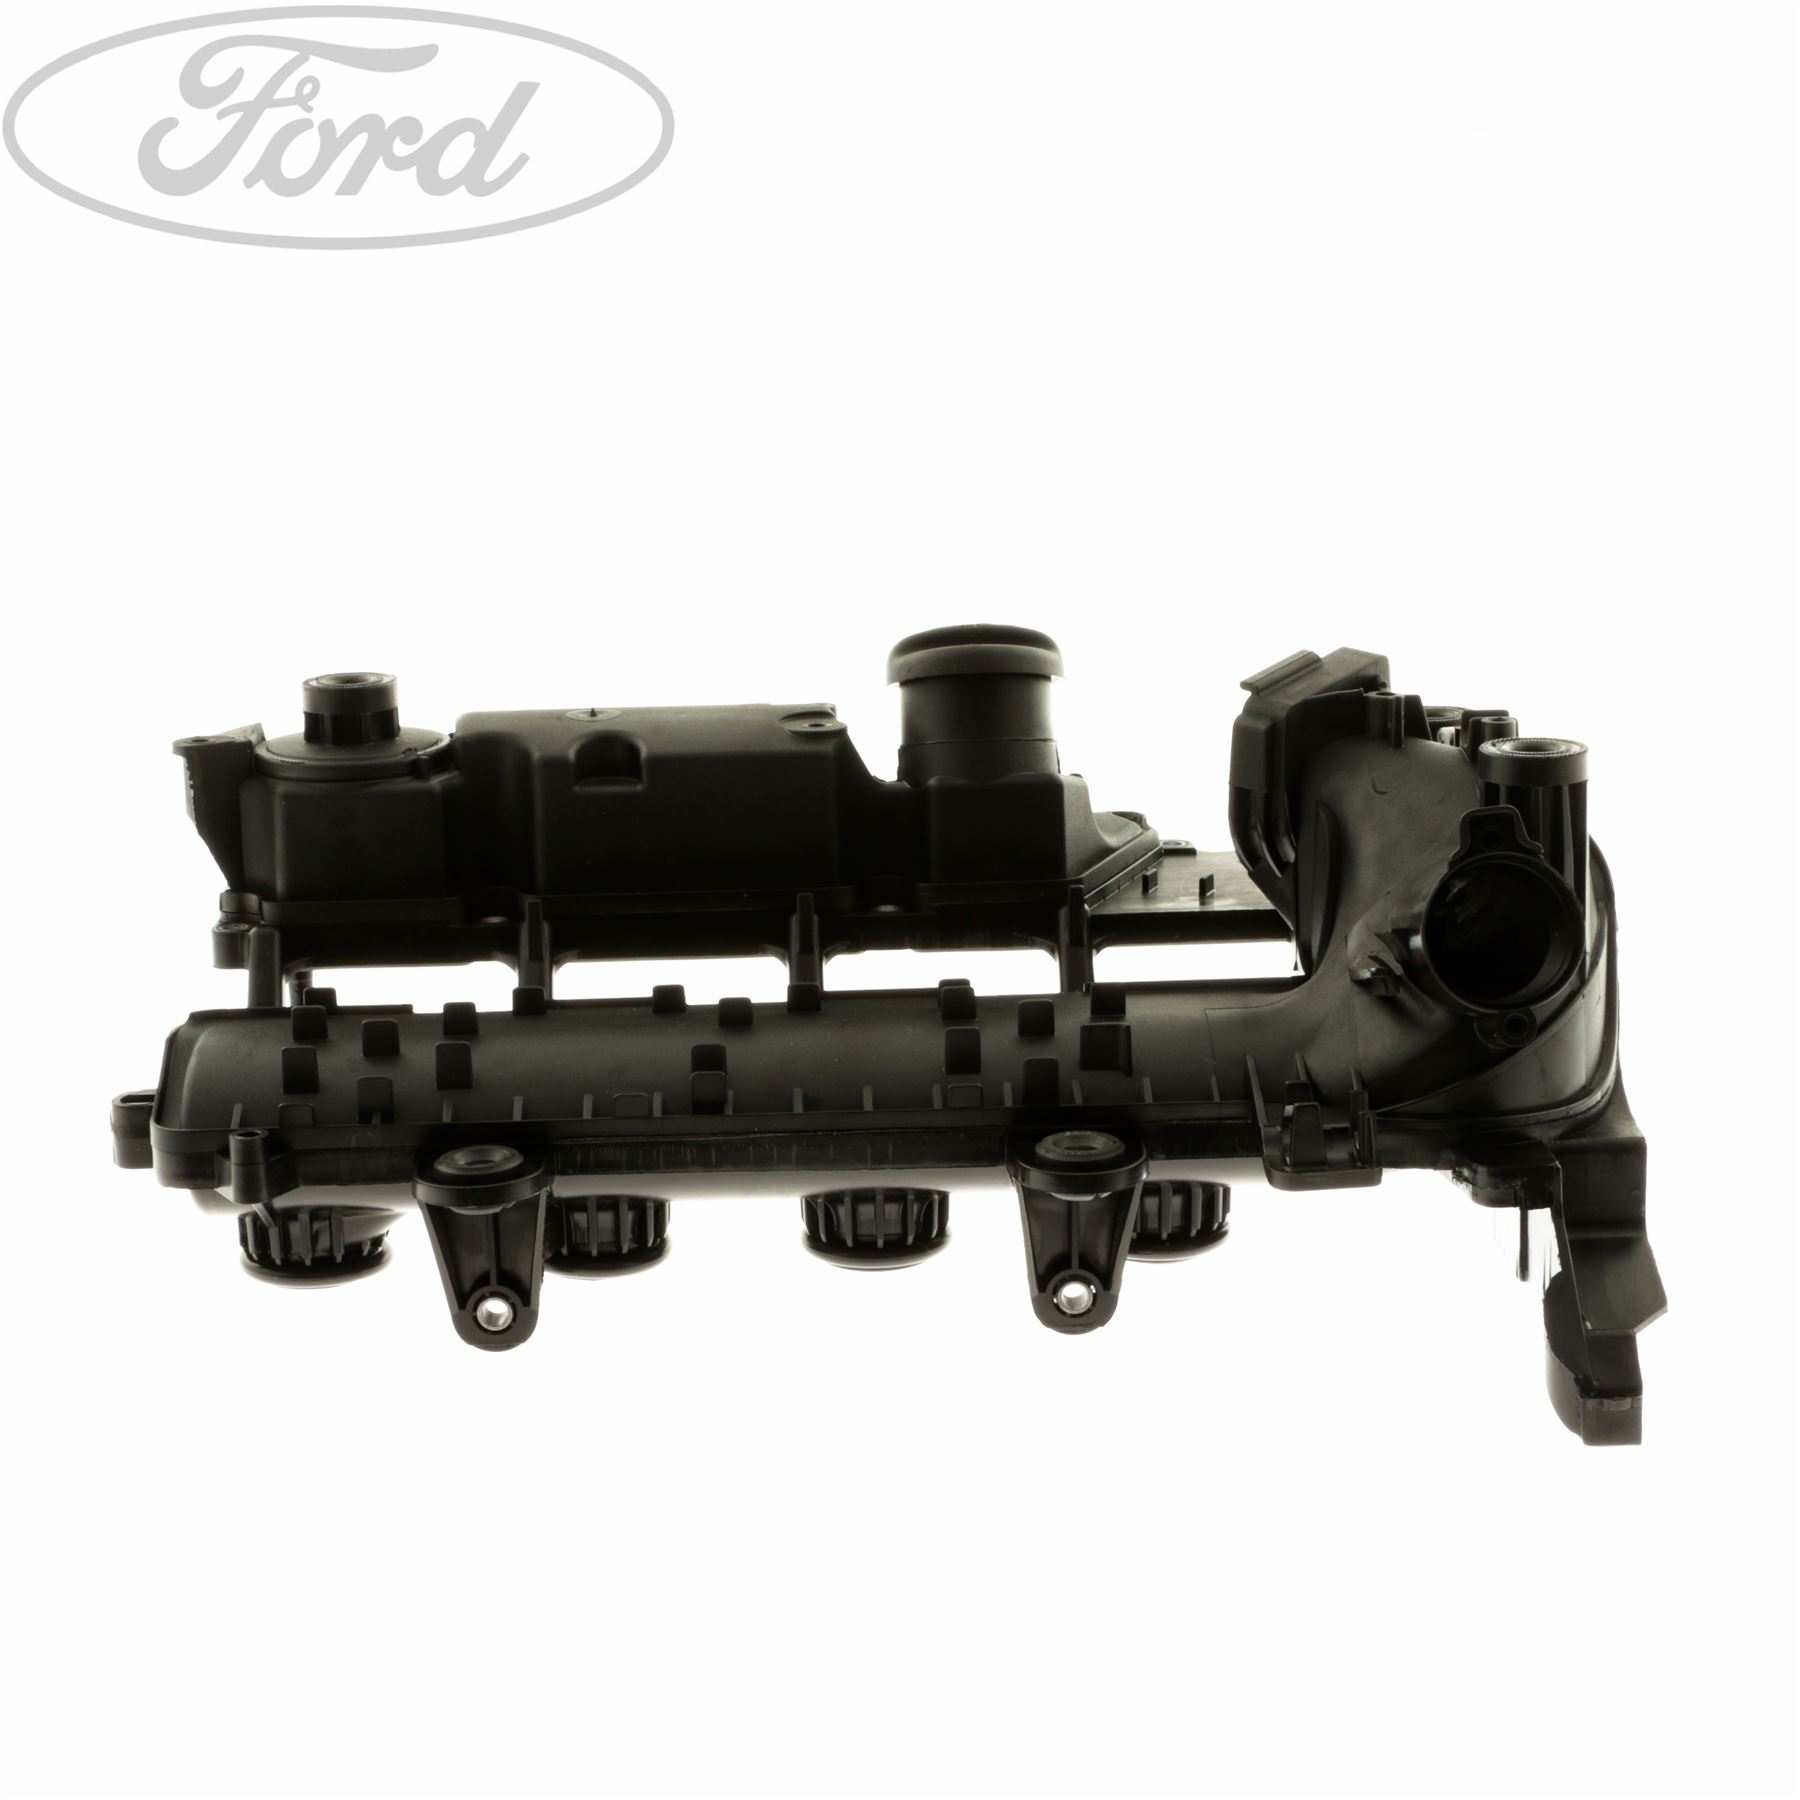 Details About Genuine Ford Fiesta MK6 MK7 14 TDCi Diesel Inlet Intake Manifold 1508417